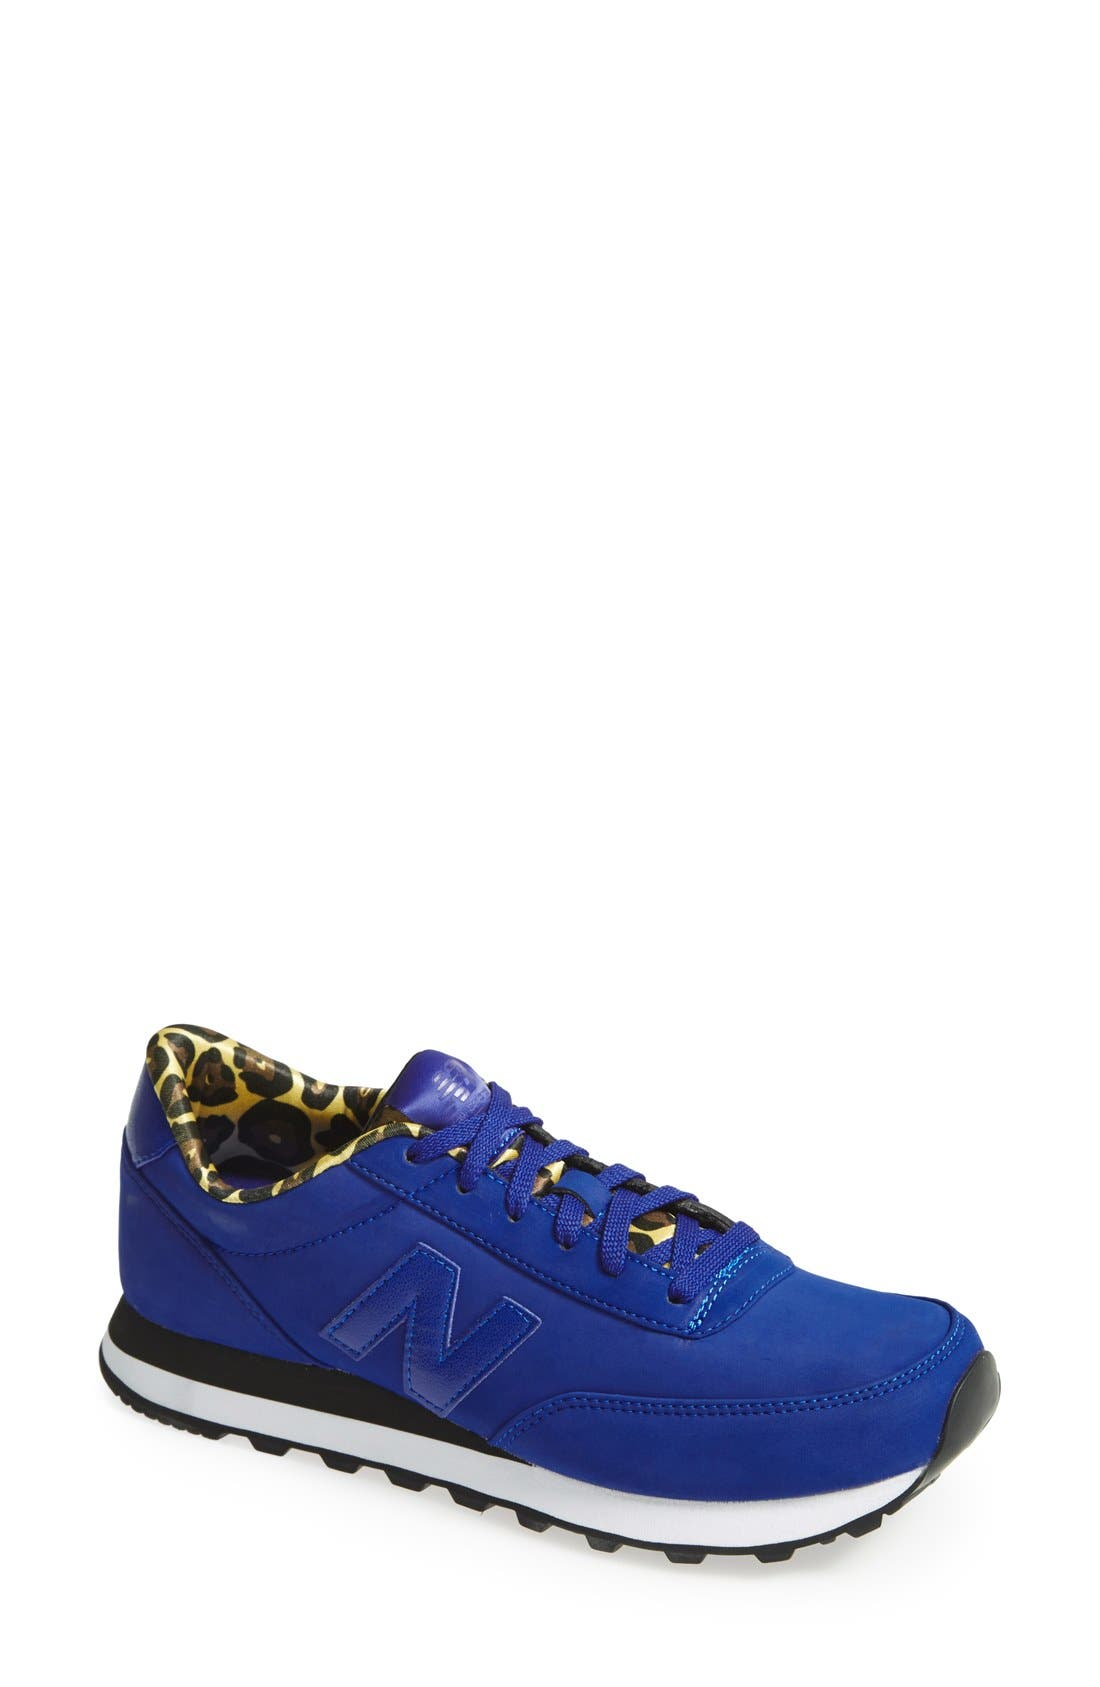 Alternate Image 1 Selected - New Balance '501' Sneaker (Women)